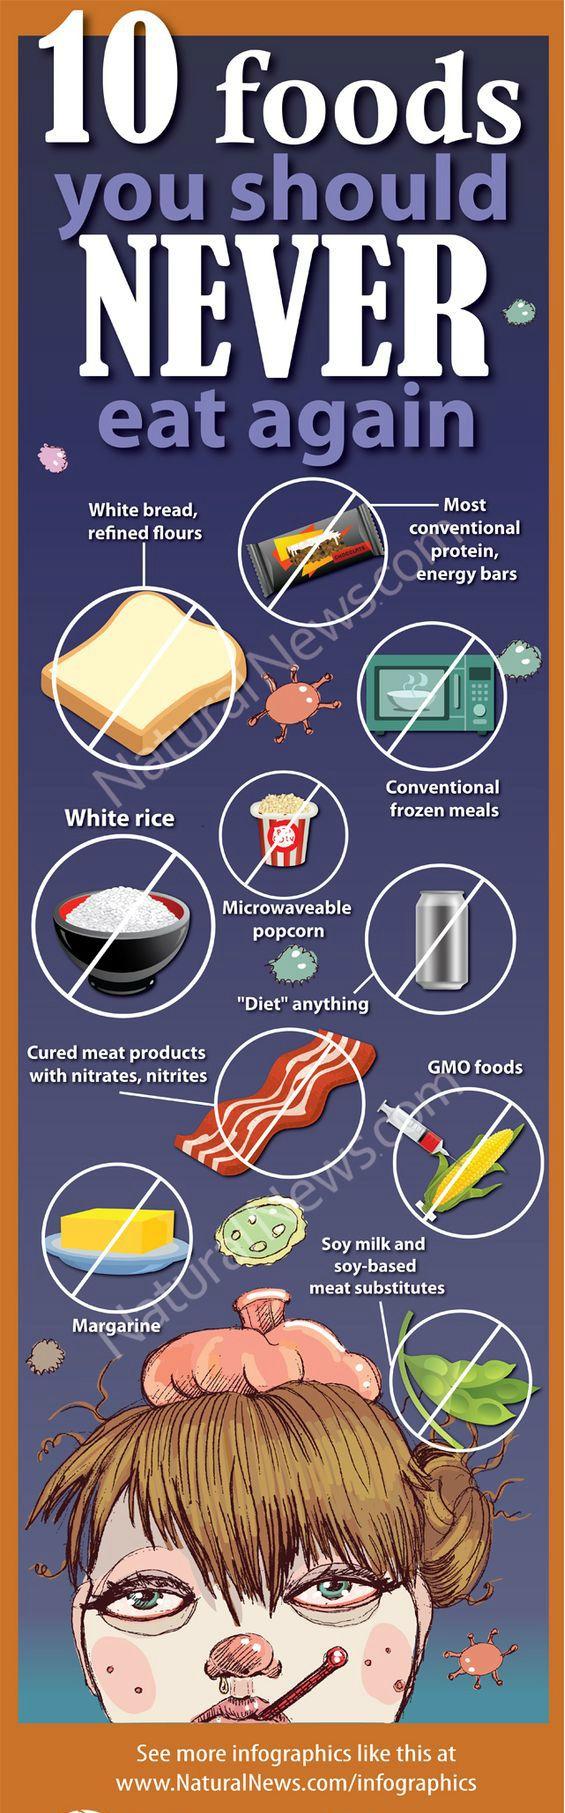 10 foods you should never eat again #diet #weightlossdiet #bellyfat #healthydiet #losebellyfat #howtolosebodyfat